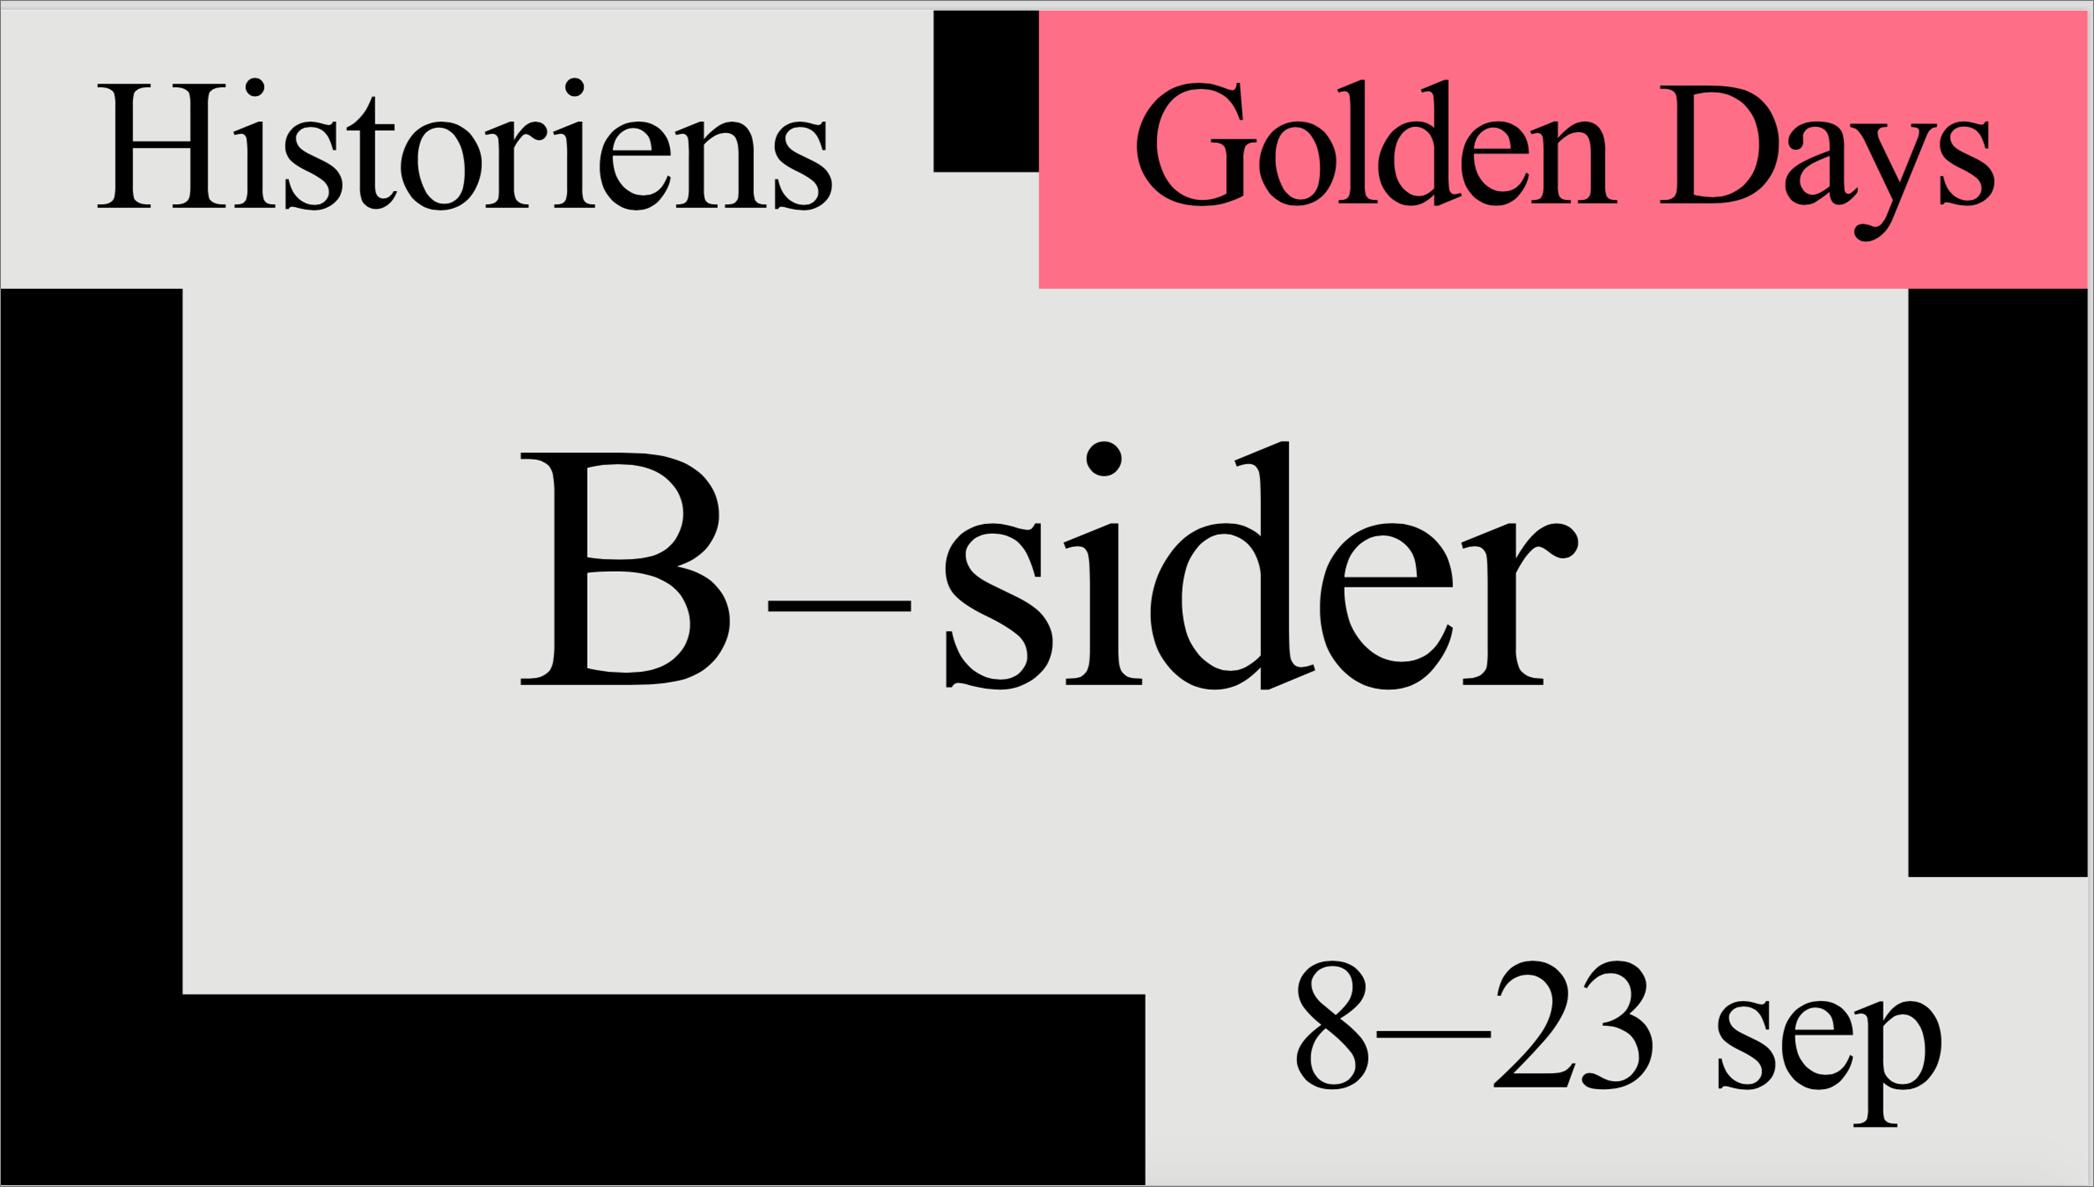 Golden days historiens b-sider.png